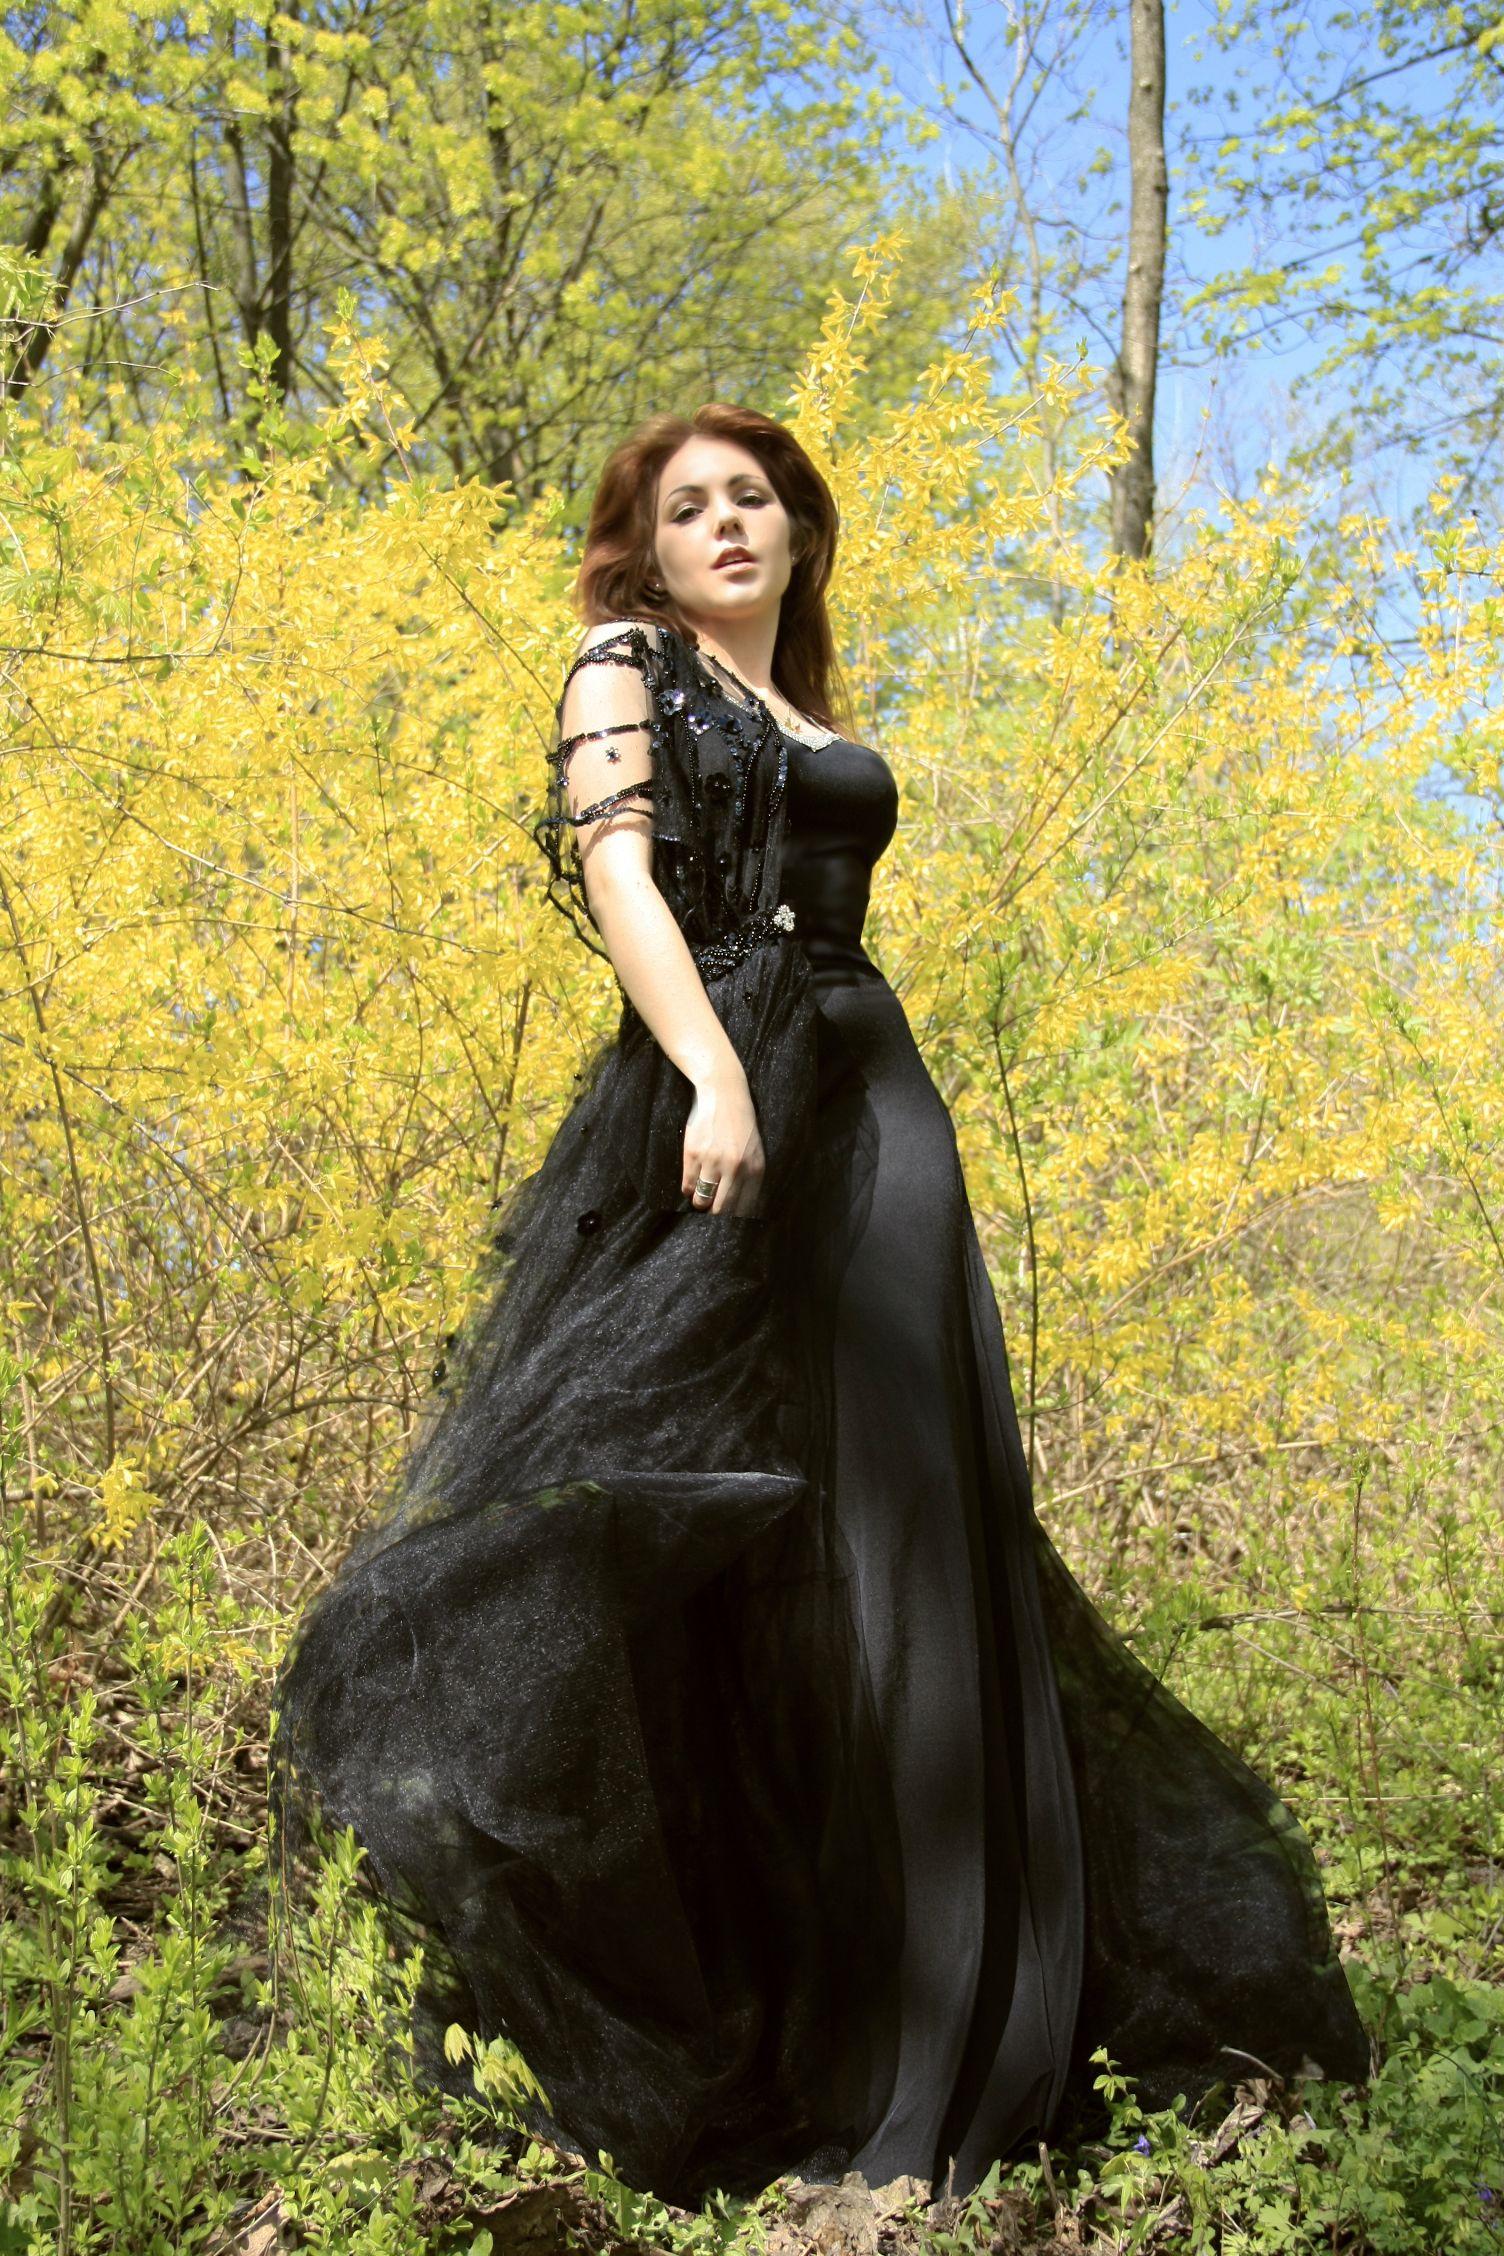 Pin by annarichdesigns on evening dress pinterest black evening